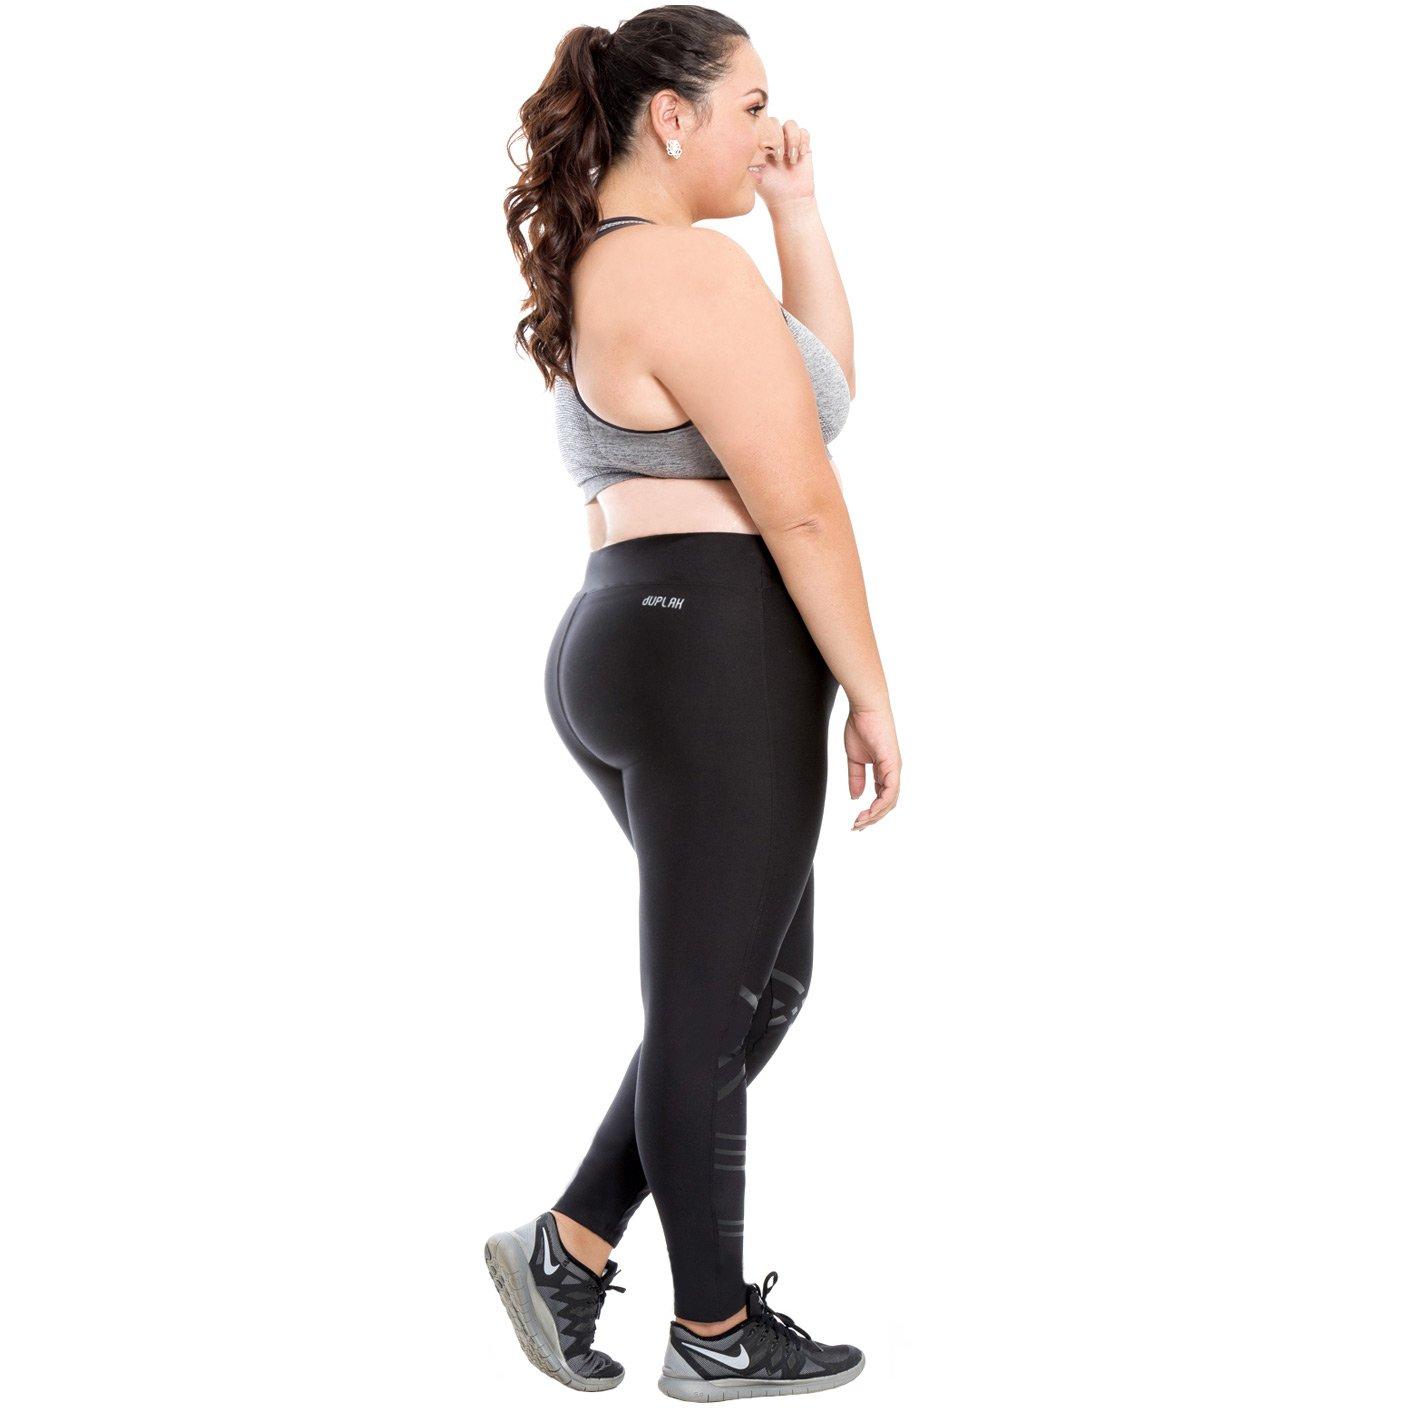 c9933d1dfa9d6 Duplah Rio Womens Fashion Plus Size Leggings Workout Pants Ropa Deportiva  Mujer at Amazon Women's Clothing store: